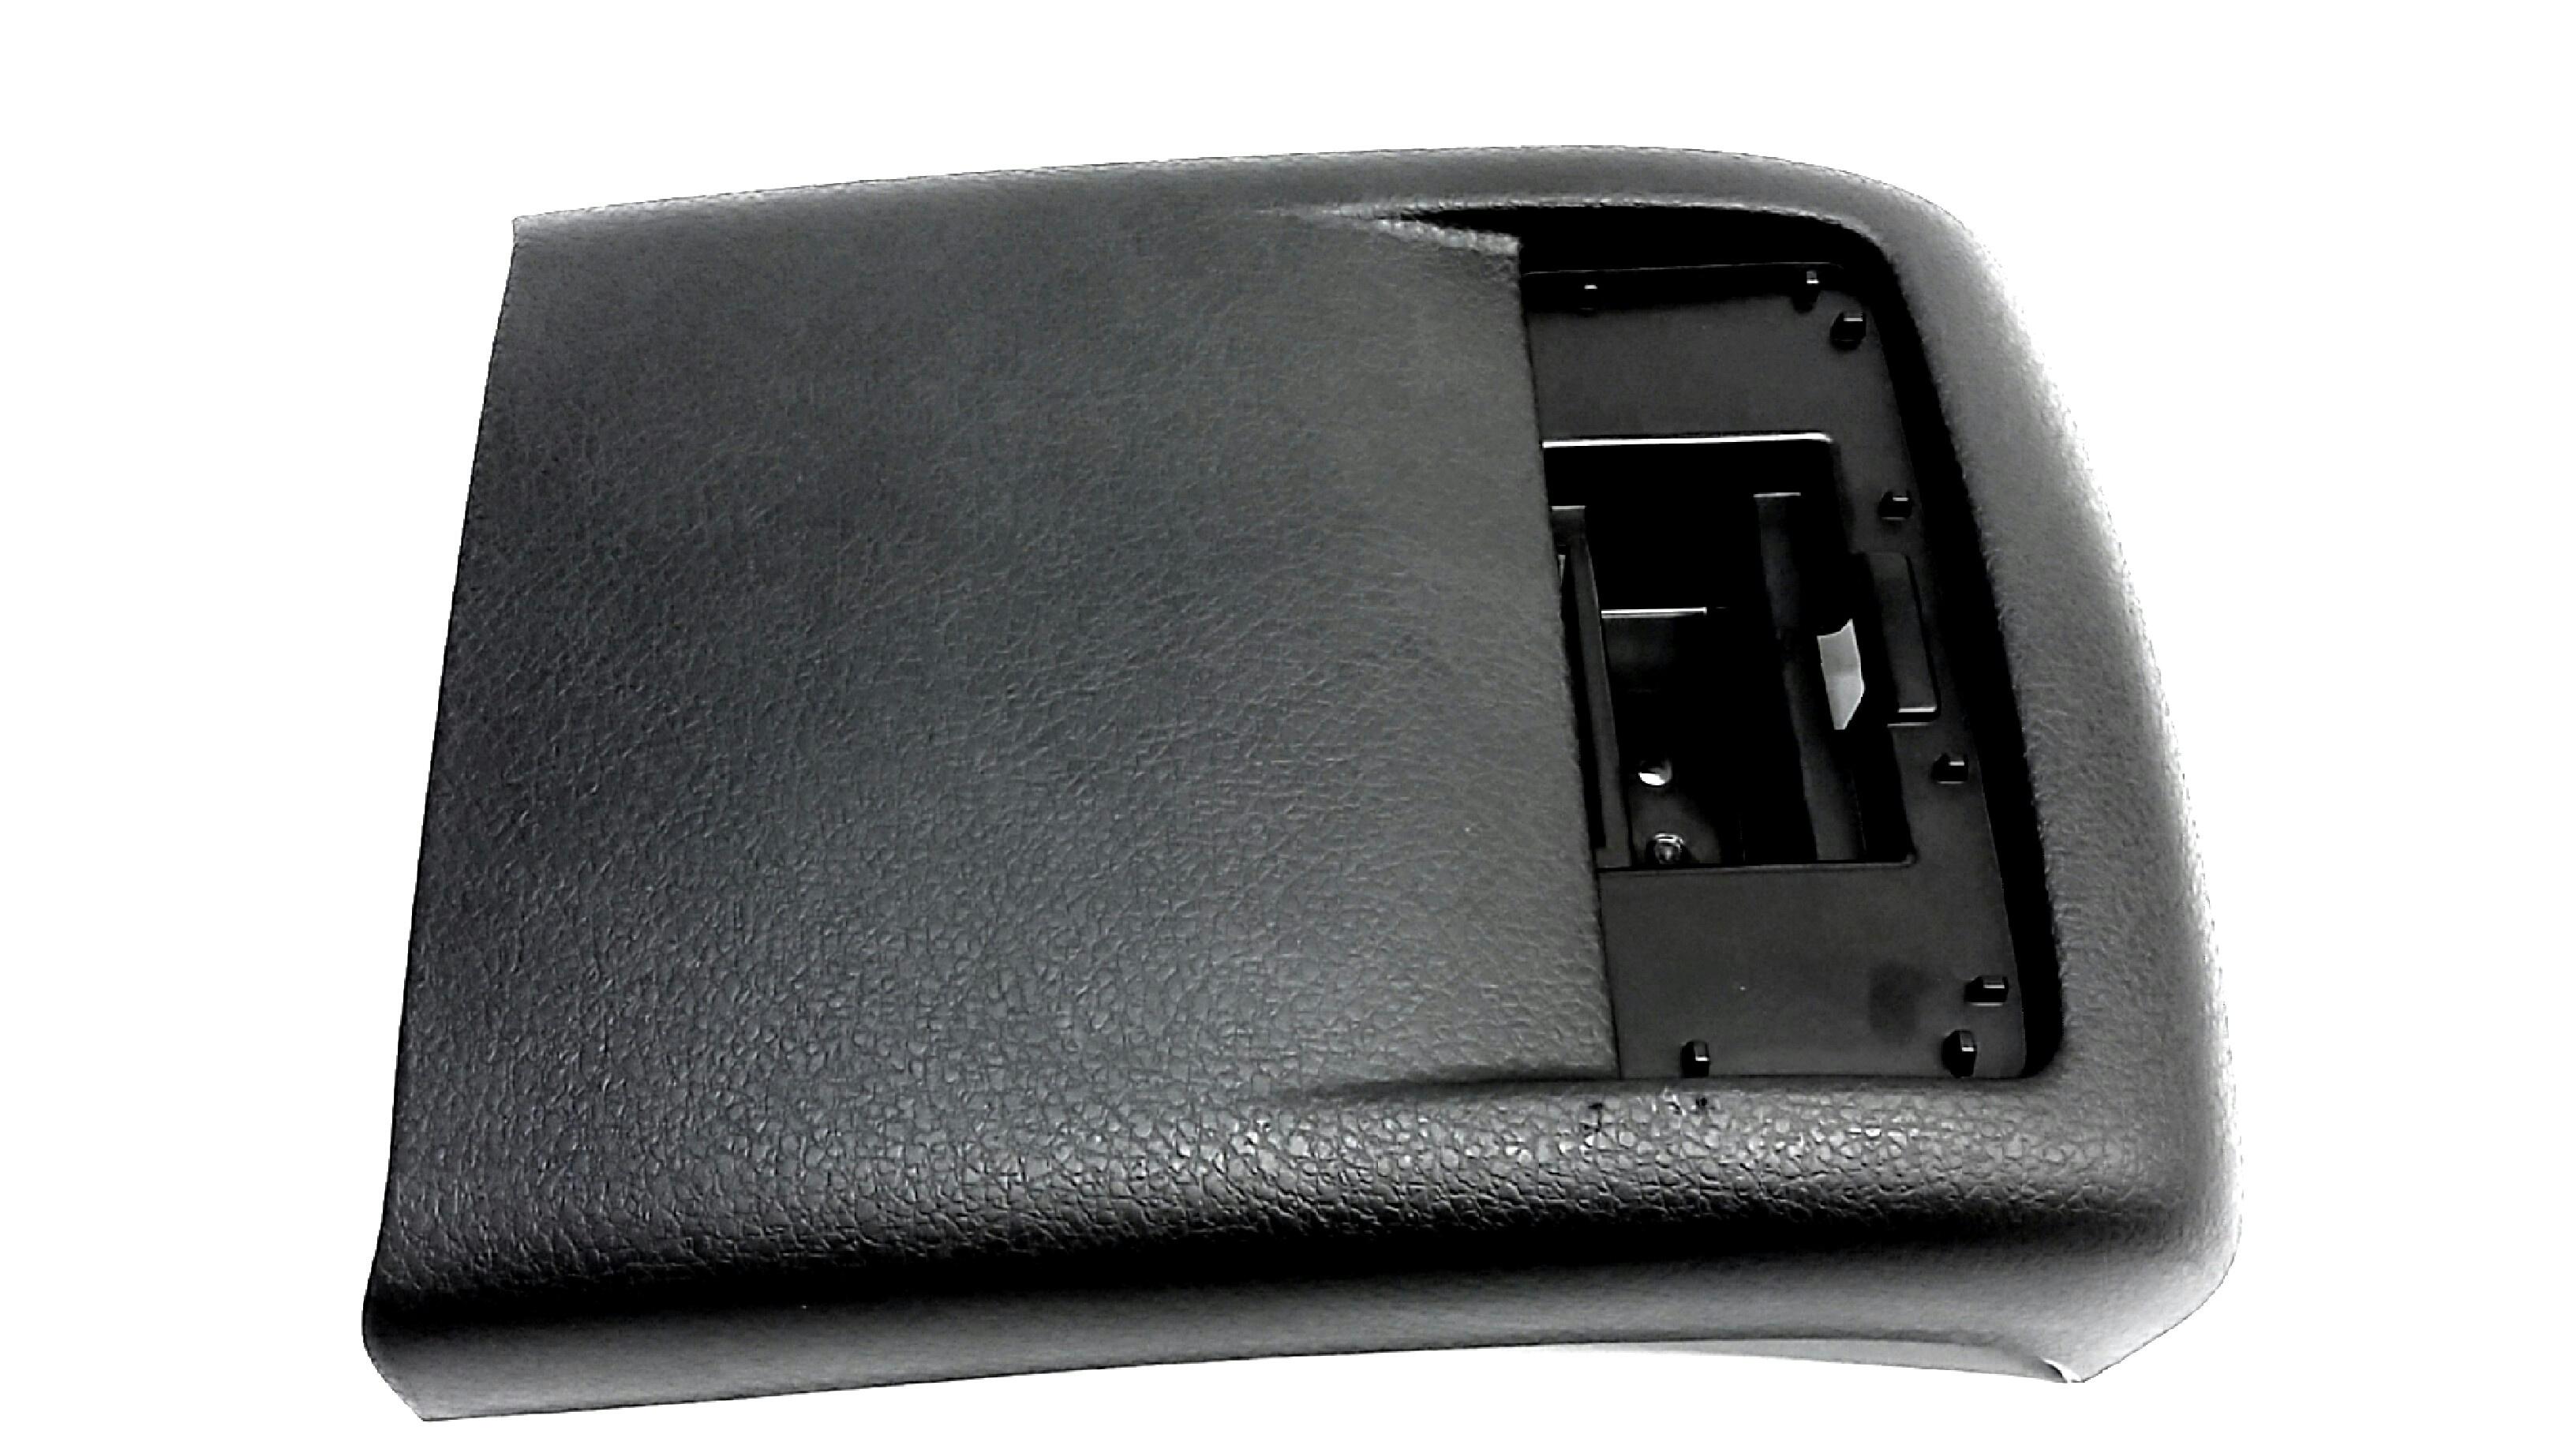 2013 Subaru WRX 2.5L TURBO 5MT 4WD WAGON Console box-rear ...